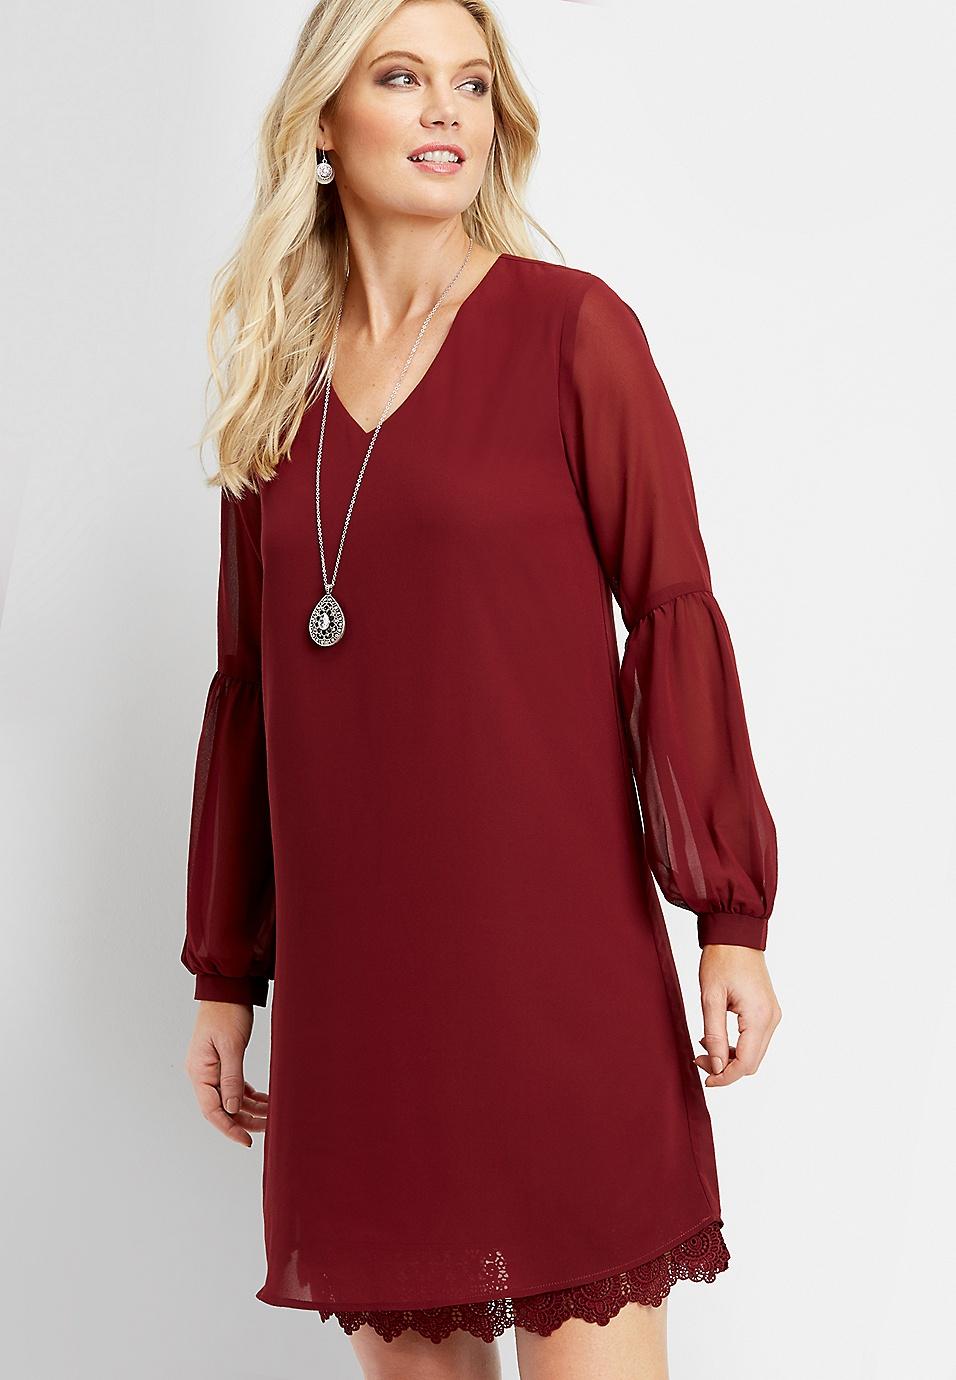 080ecc5a3d86d solid lace lantern sleeve dress   maurices